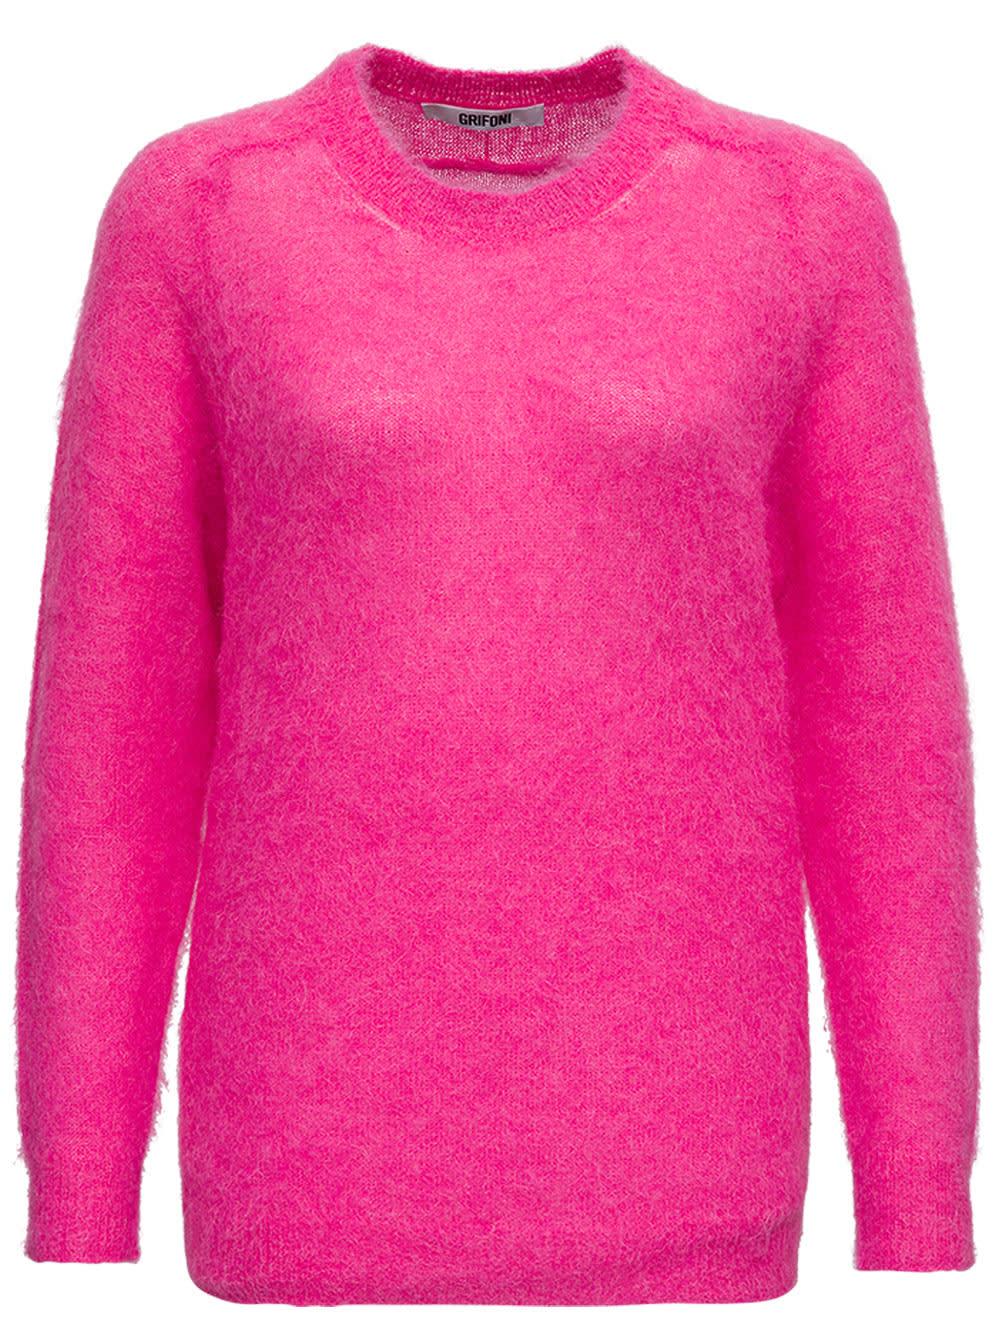 Fuchsia Mohair Sweater